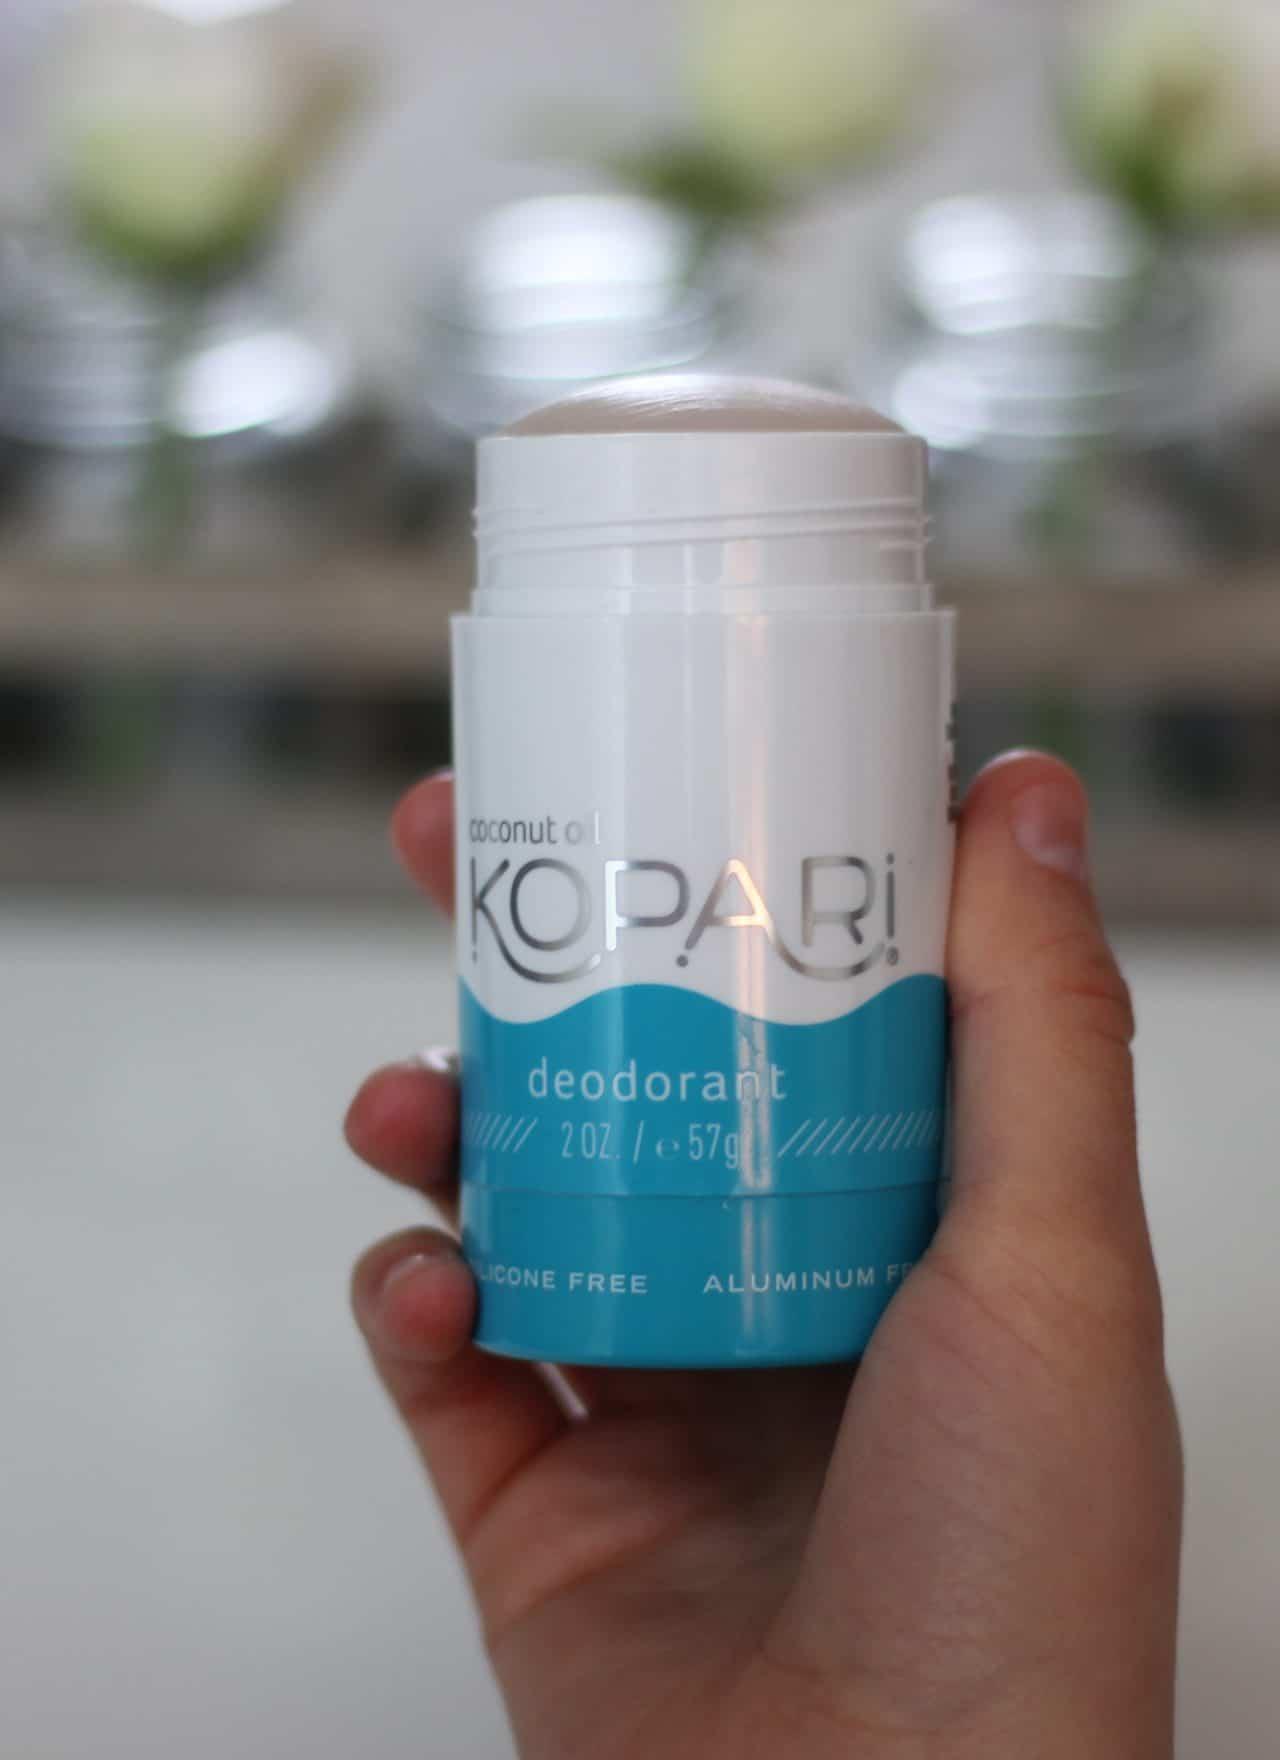 Kopari Coconut Deodorant Review